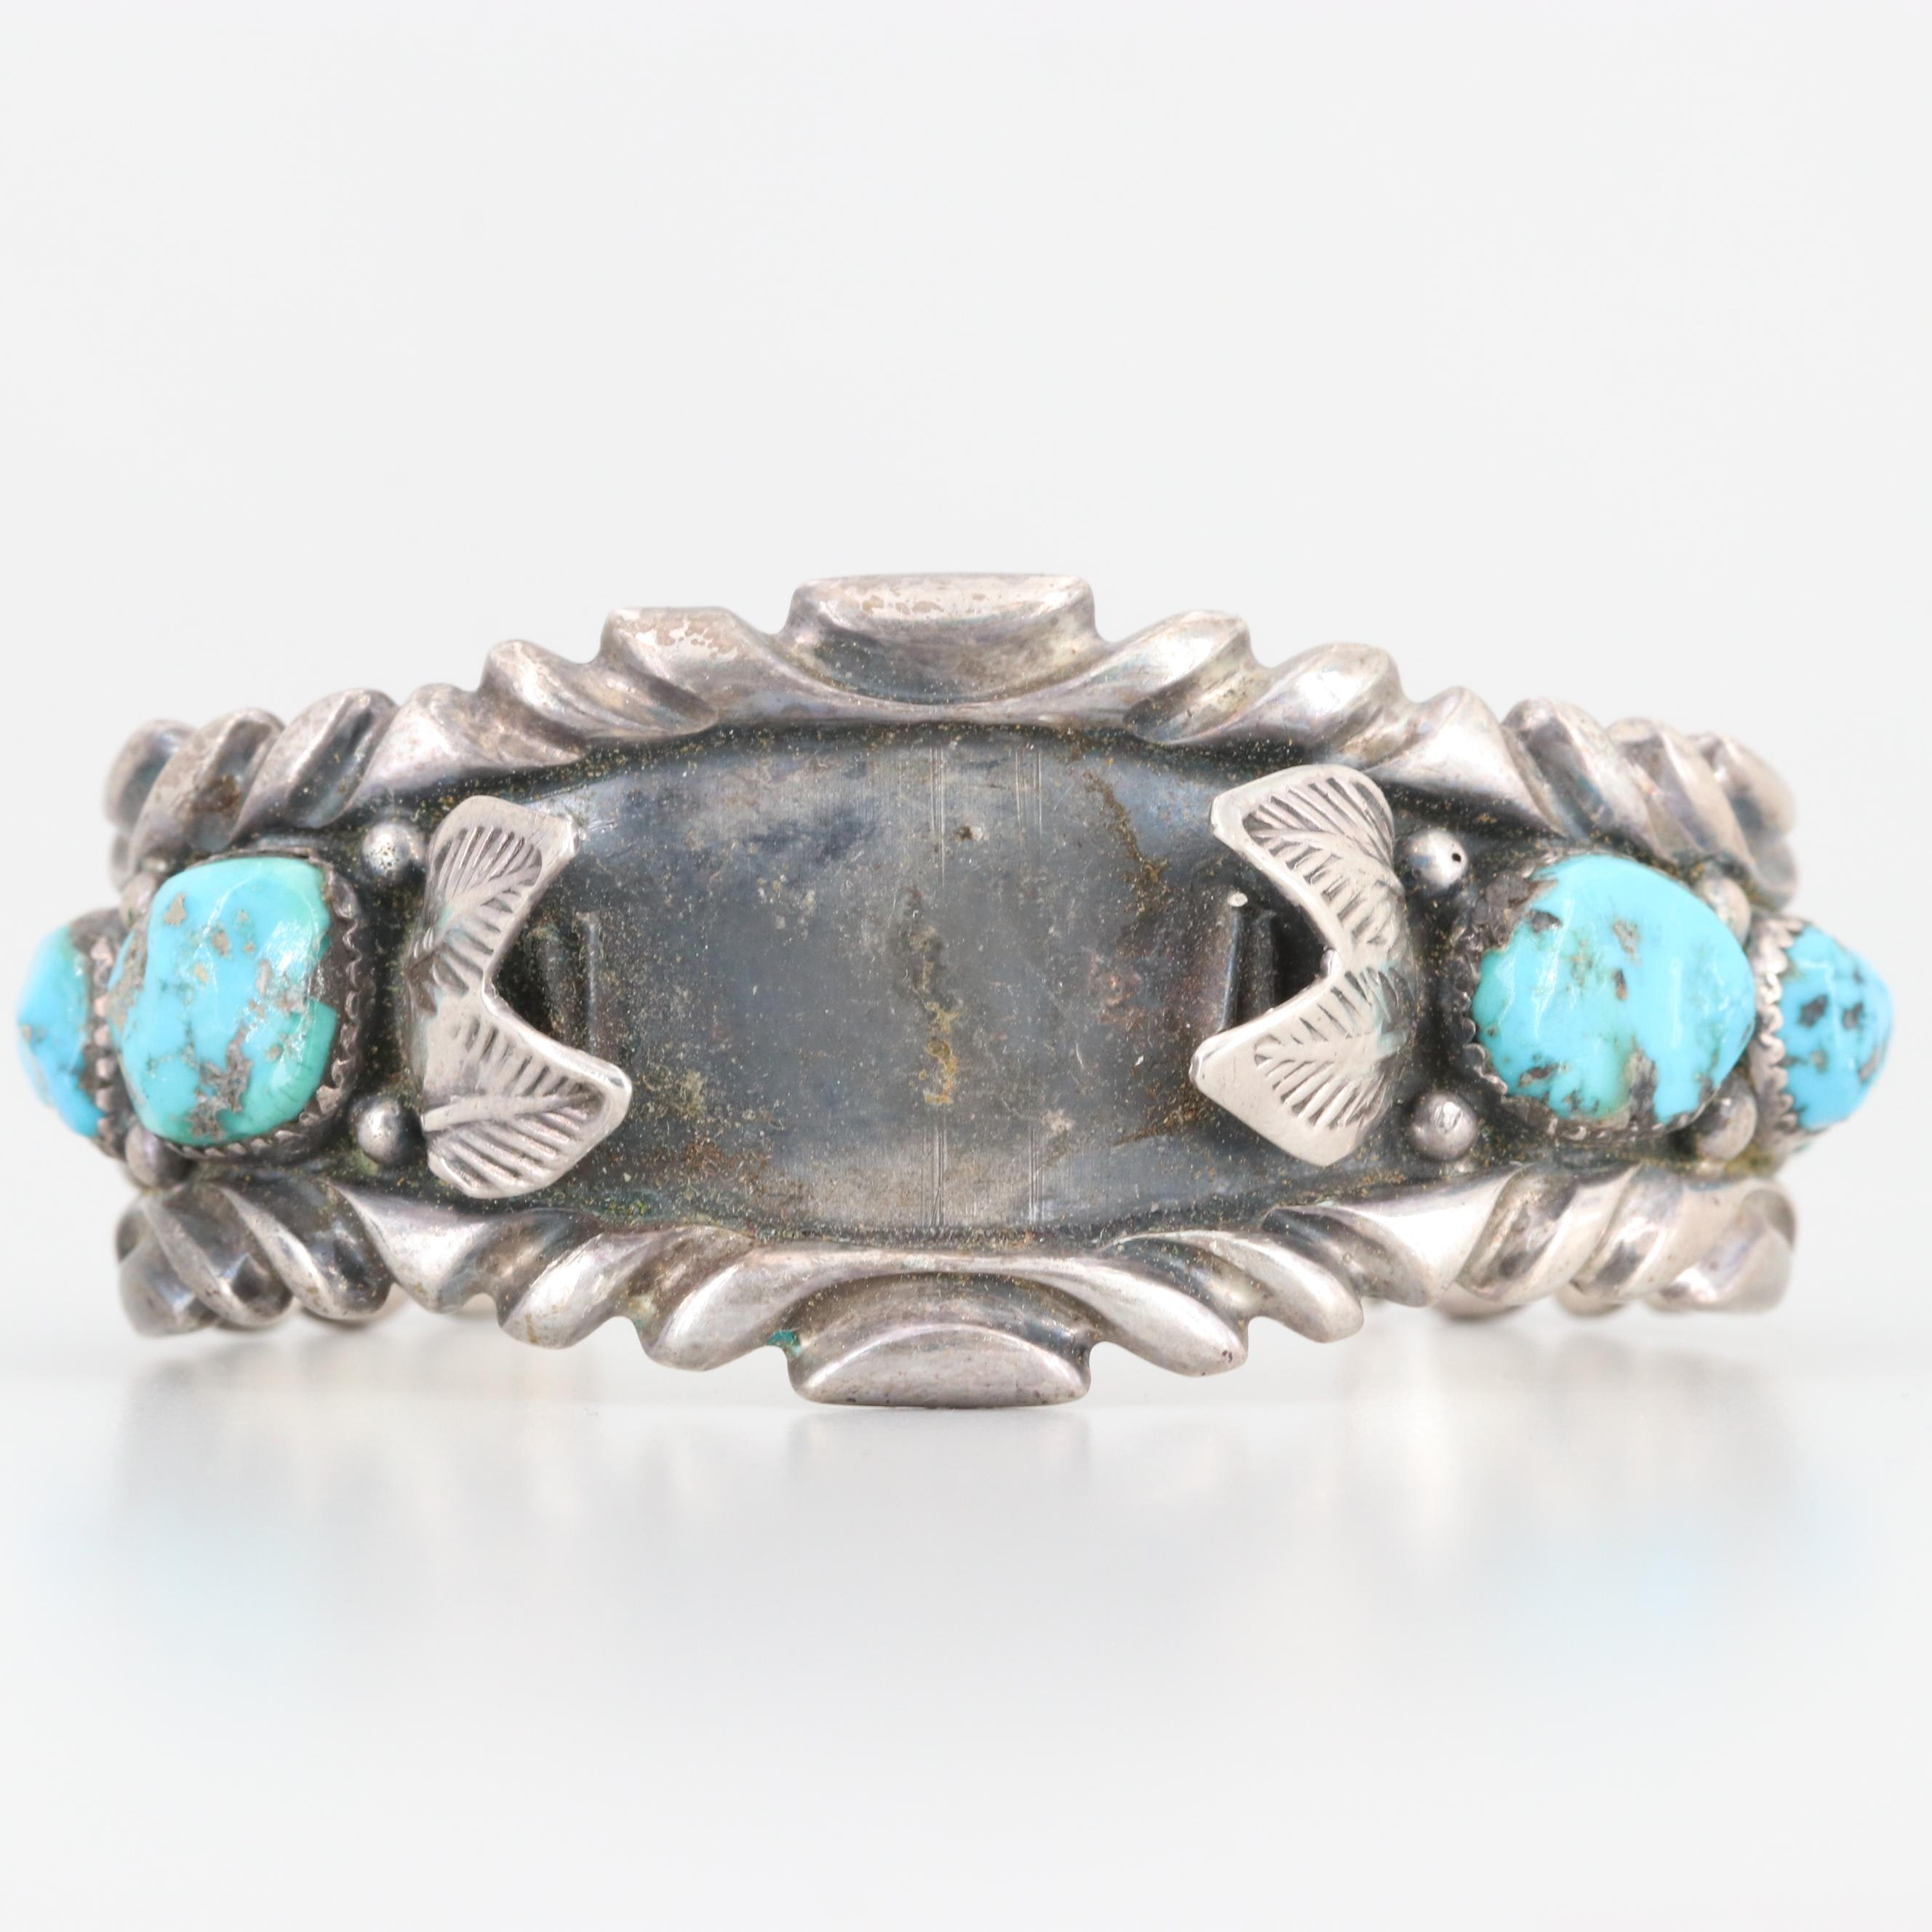 Vintage Benny Touchine Navajo Diné Turquoise Watch Cuff Bracelet